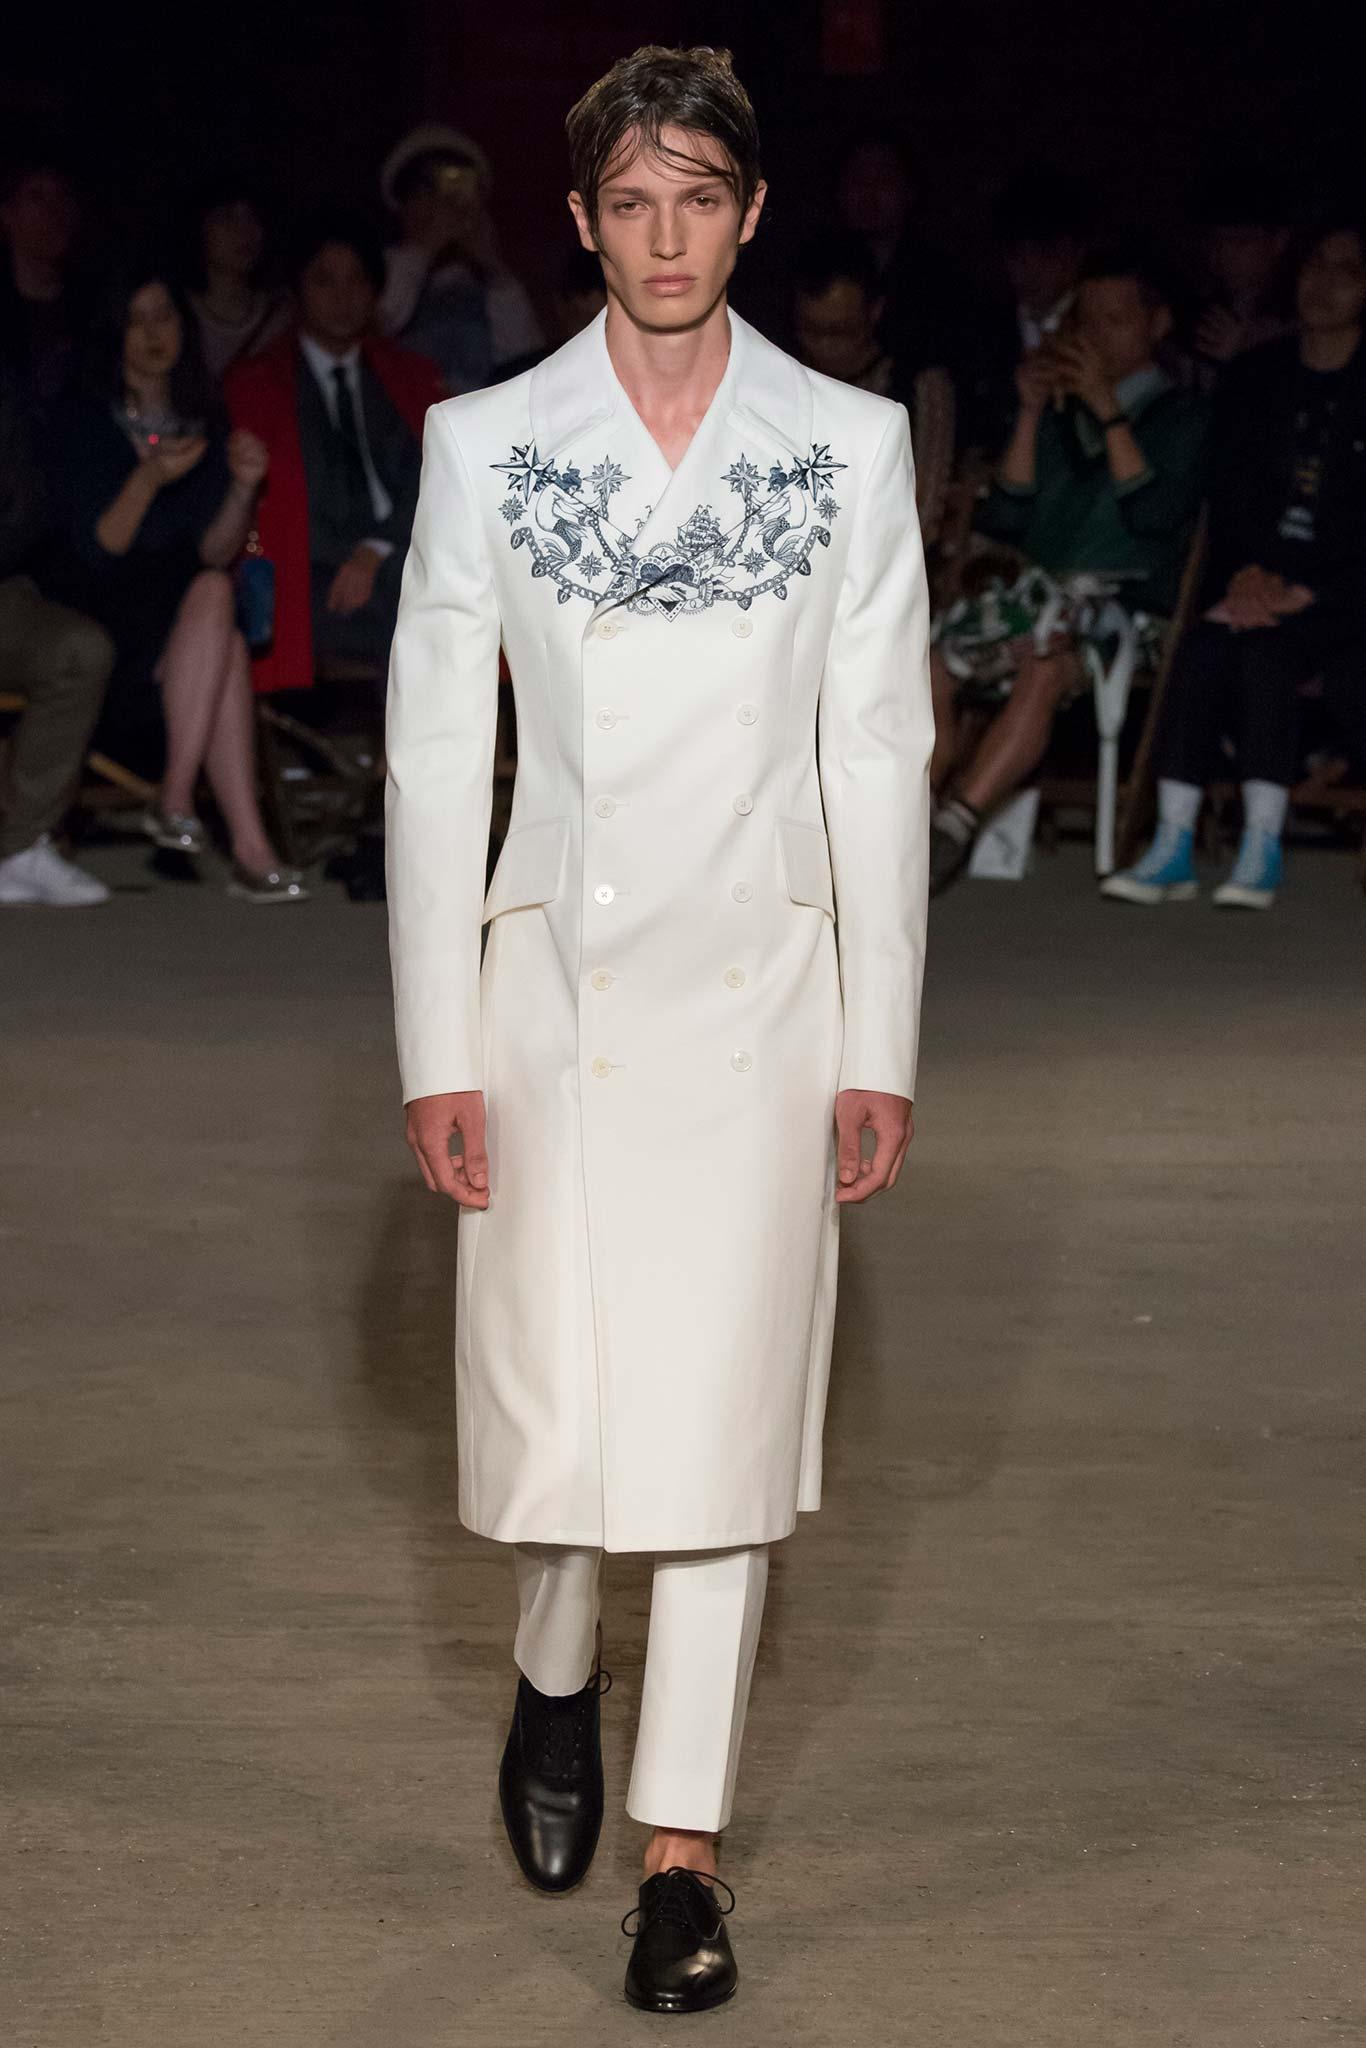 Alexander McQueen Spring/Summer 2016 Menswear